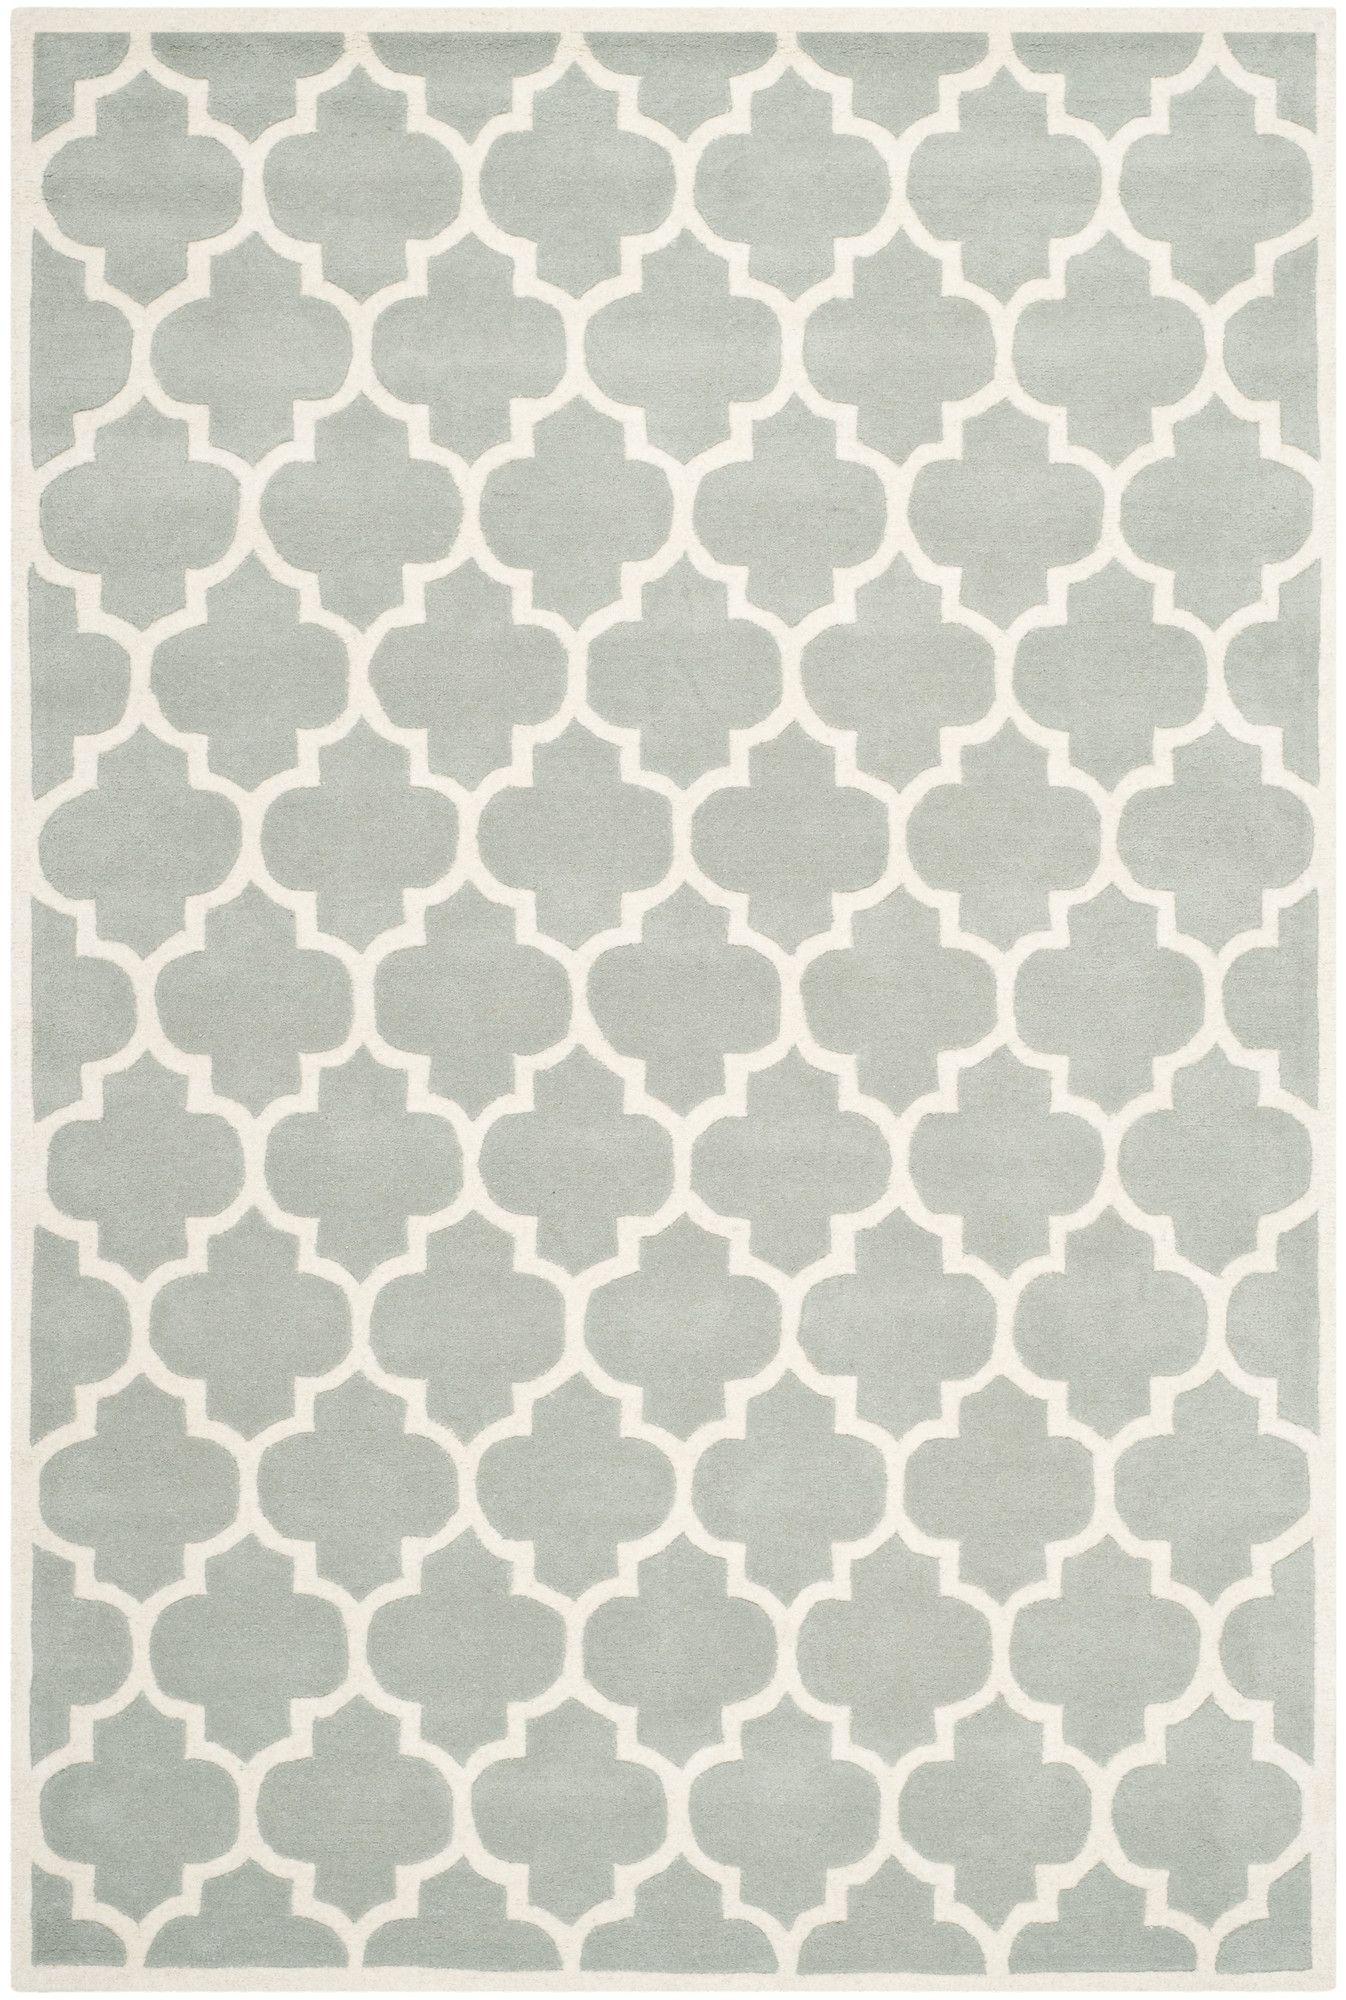 safavieh maisie grey rug reviews wayfair uk rug. Black Bedroom Furniture Sets. Home Design Ideas